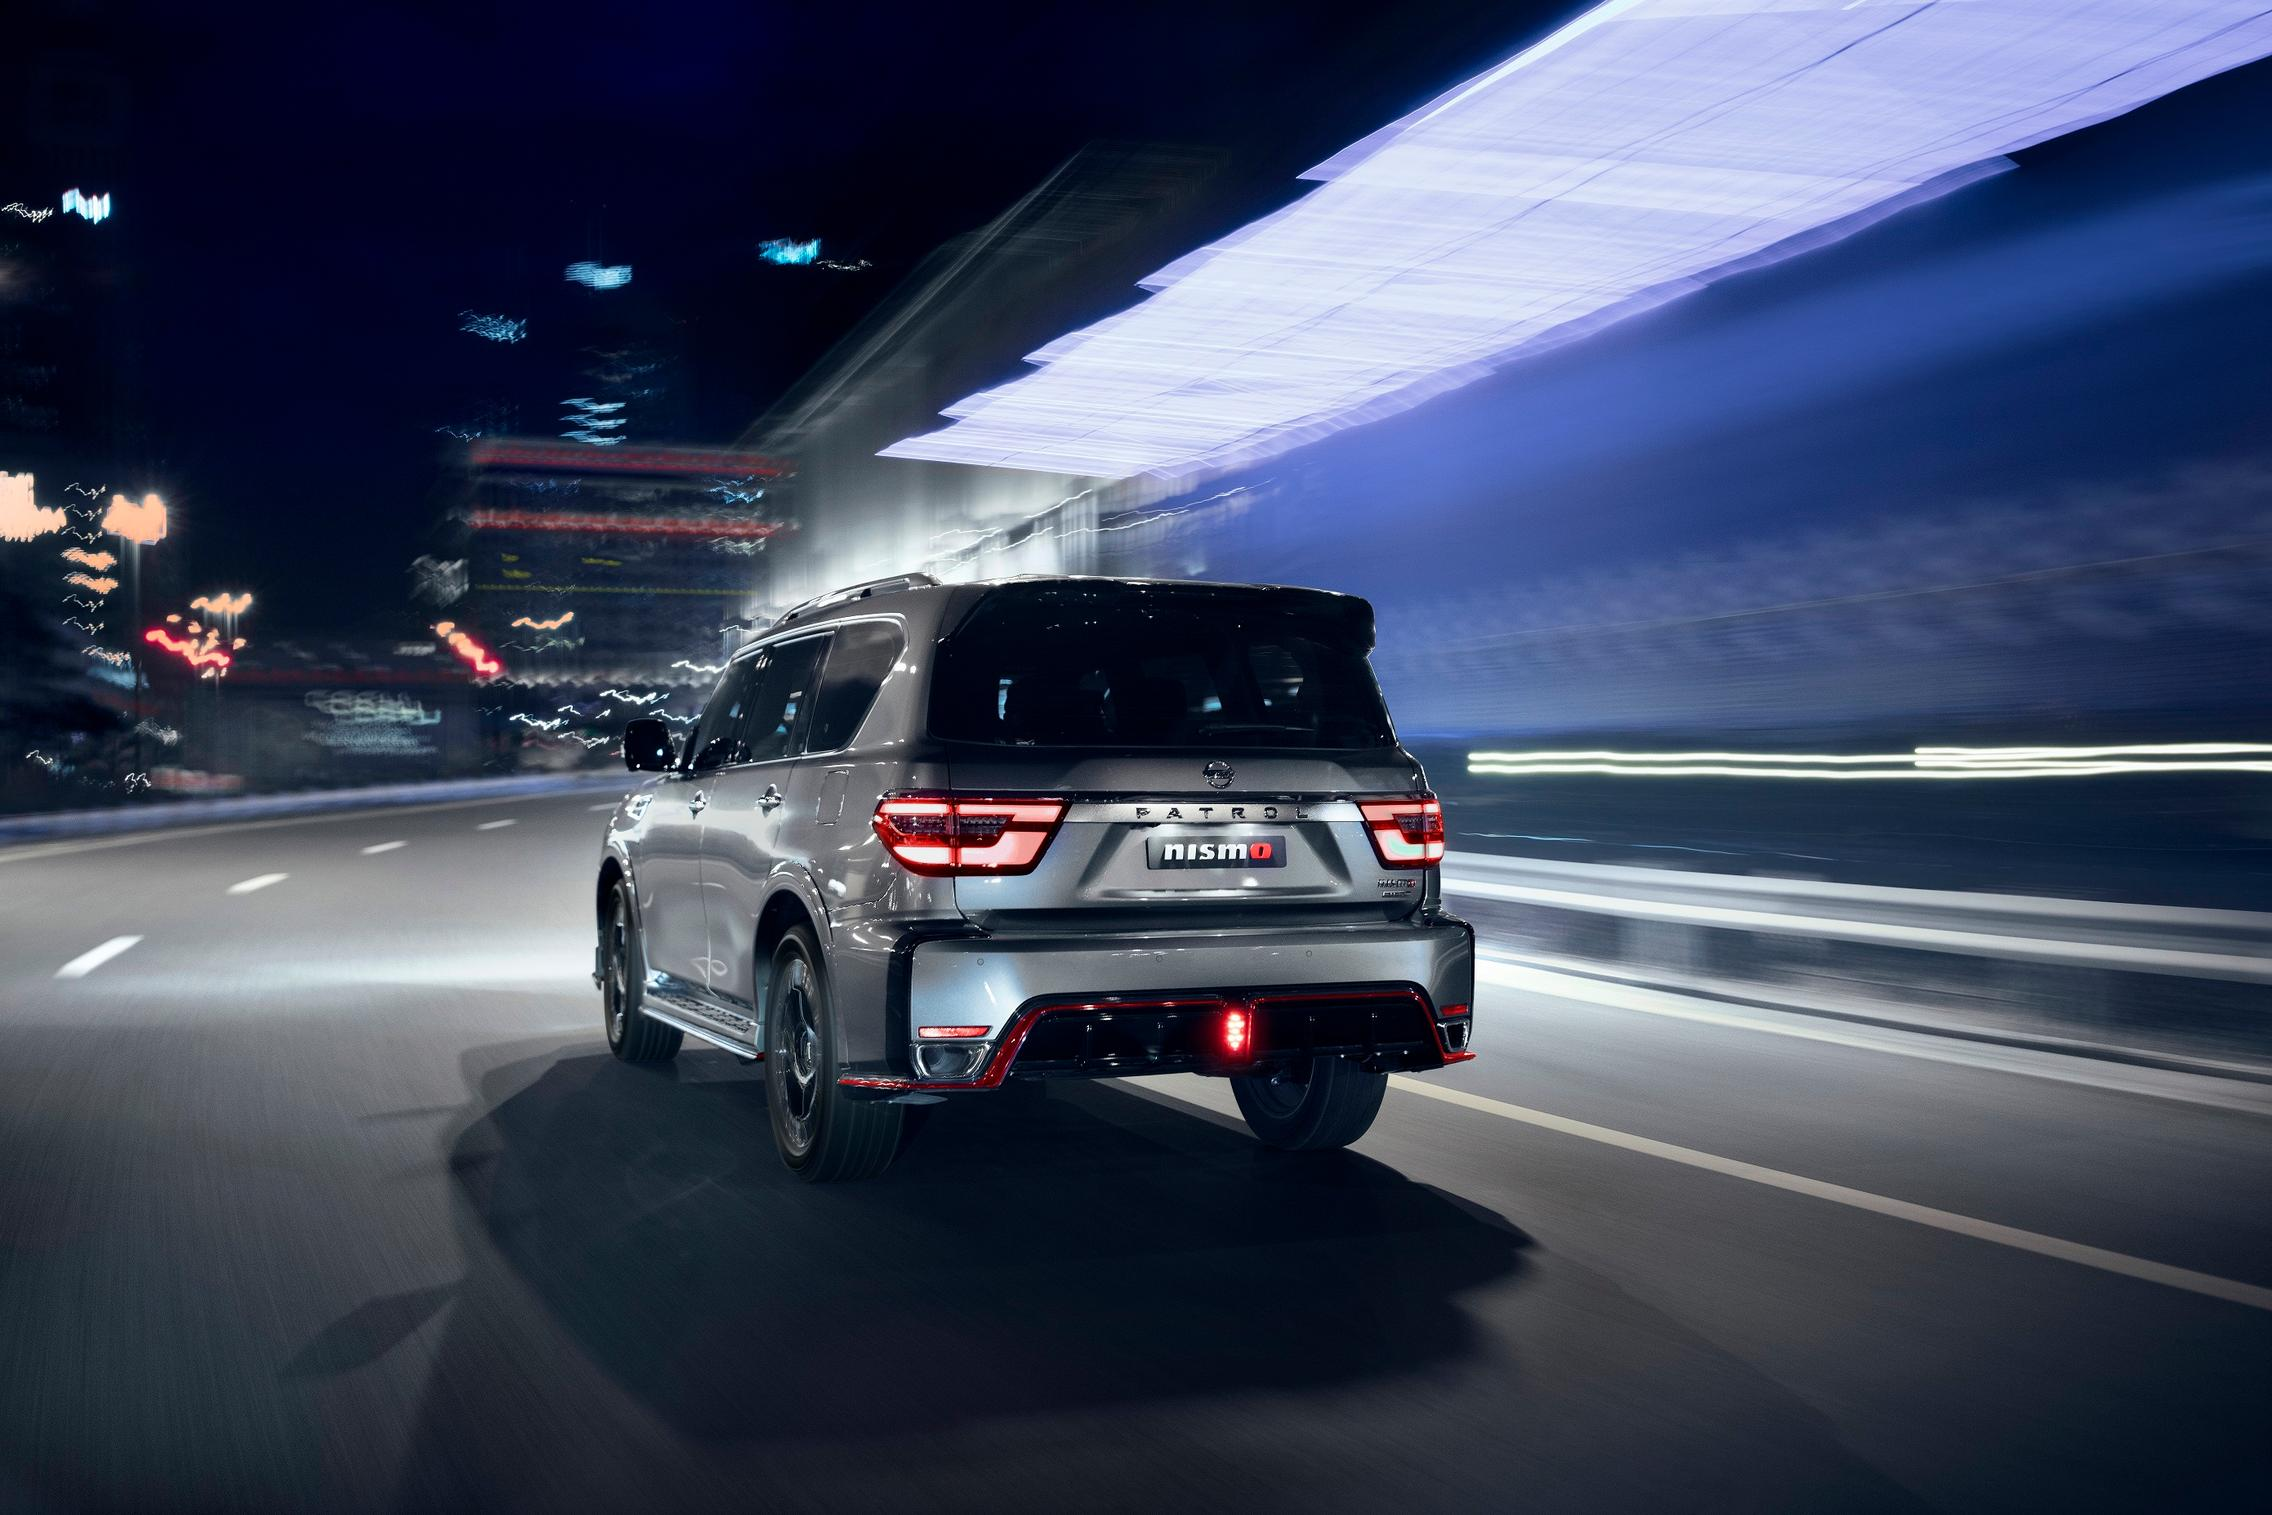 2021 Nissan Patrol NISMO rear